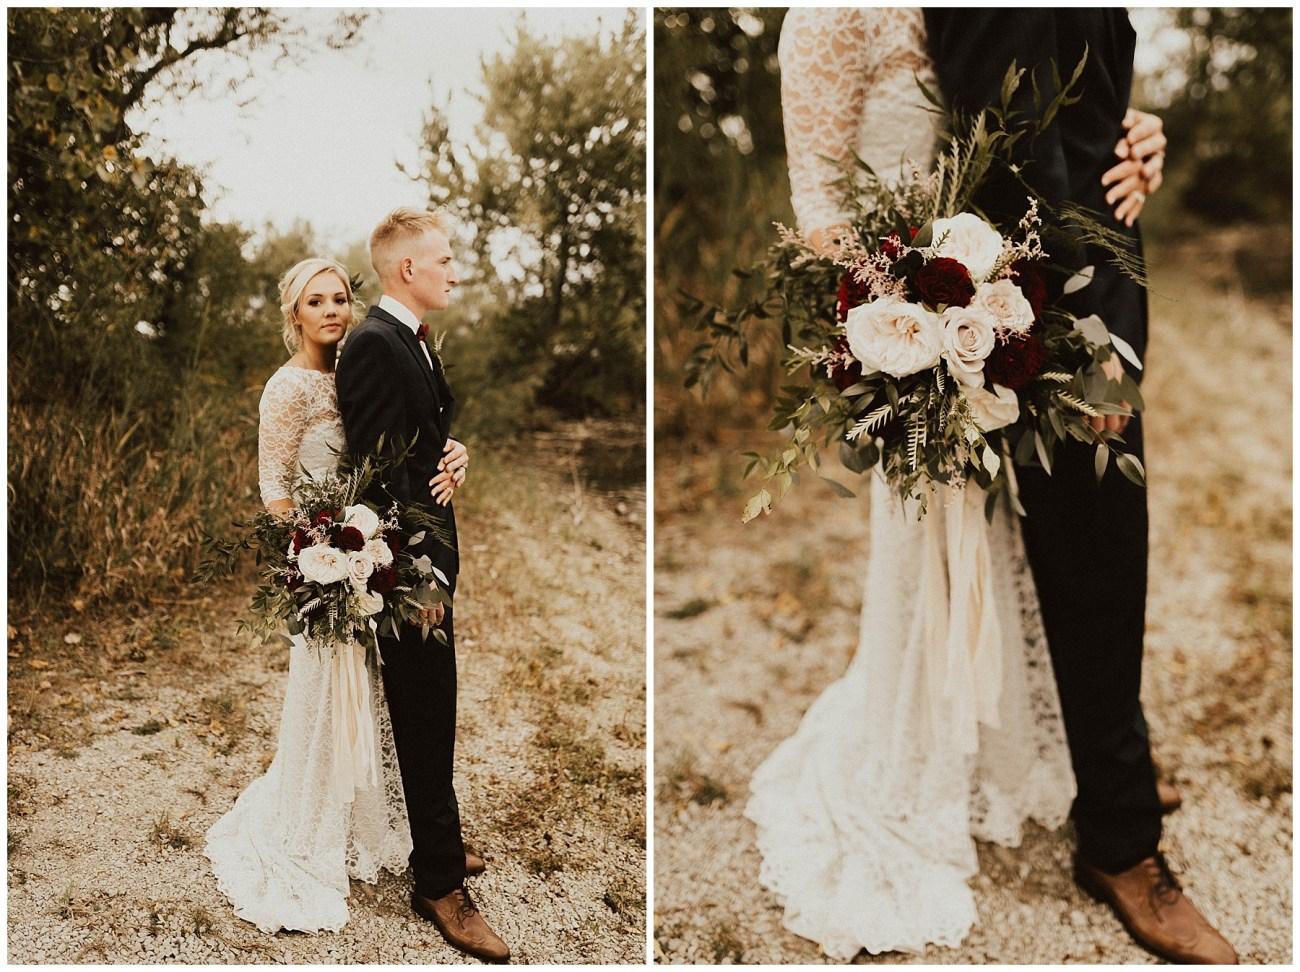 1f19c39064a6 Intimate Backyard Wedding - Lauren F.otography | Central Illinois ...